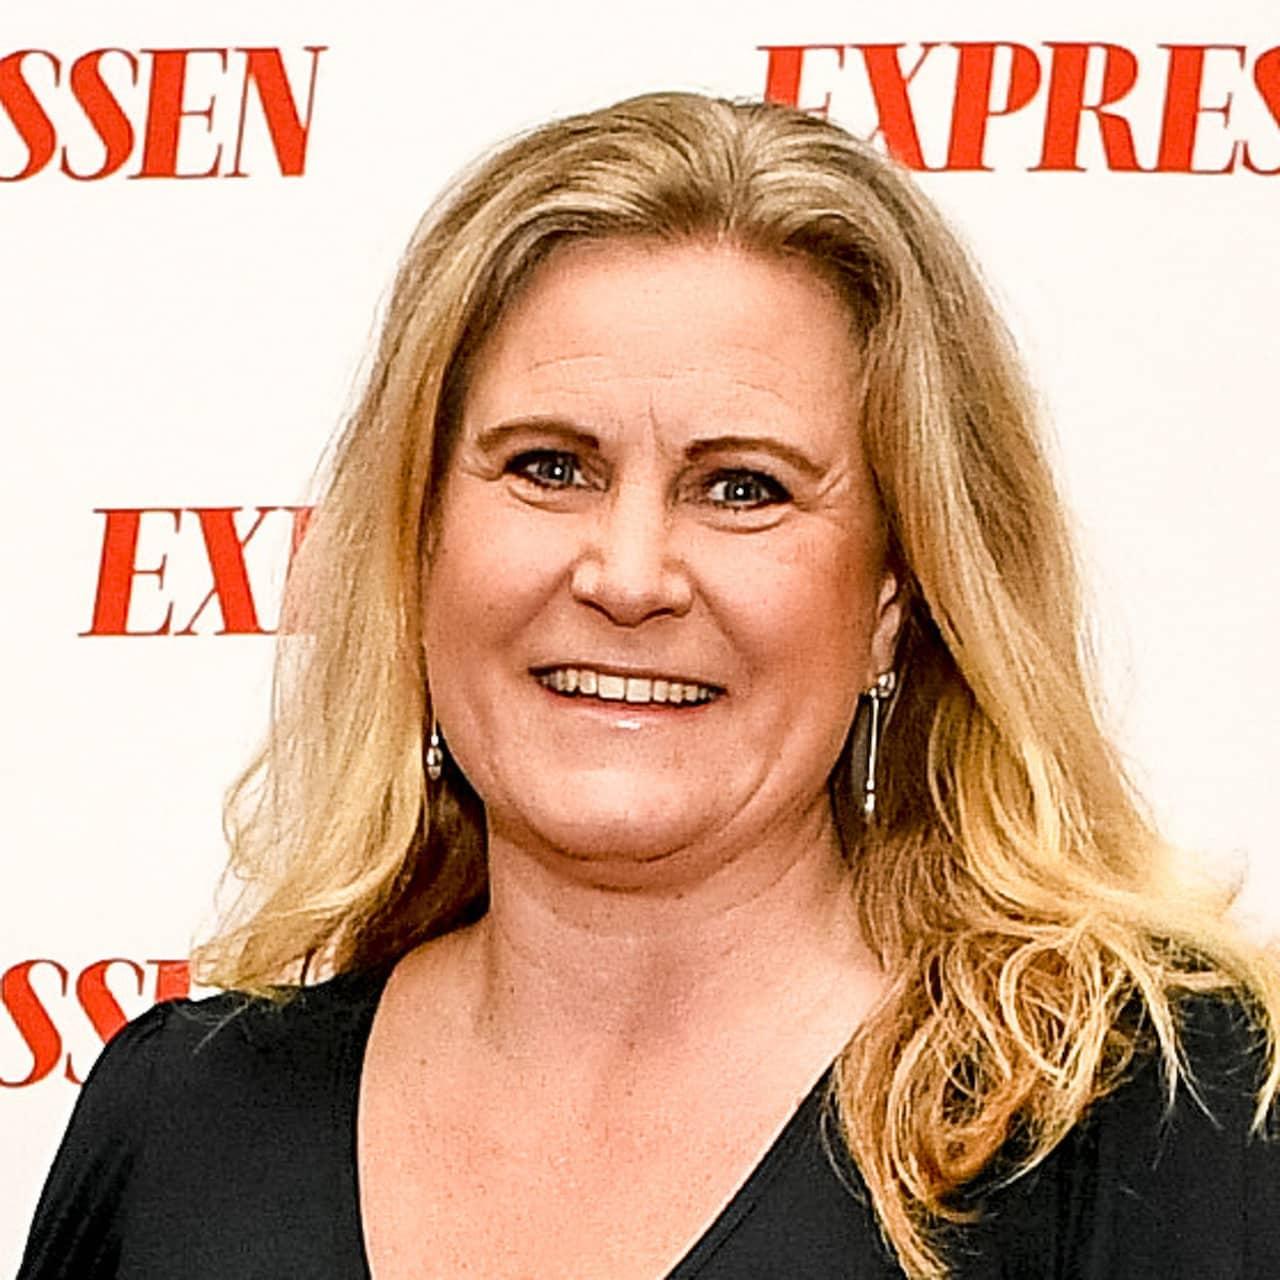 86. Camilla Kvartoft